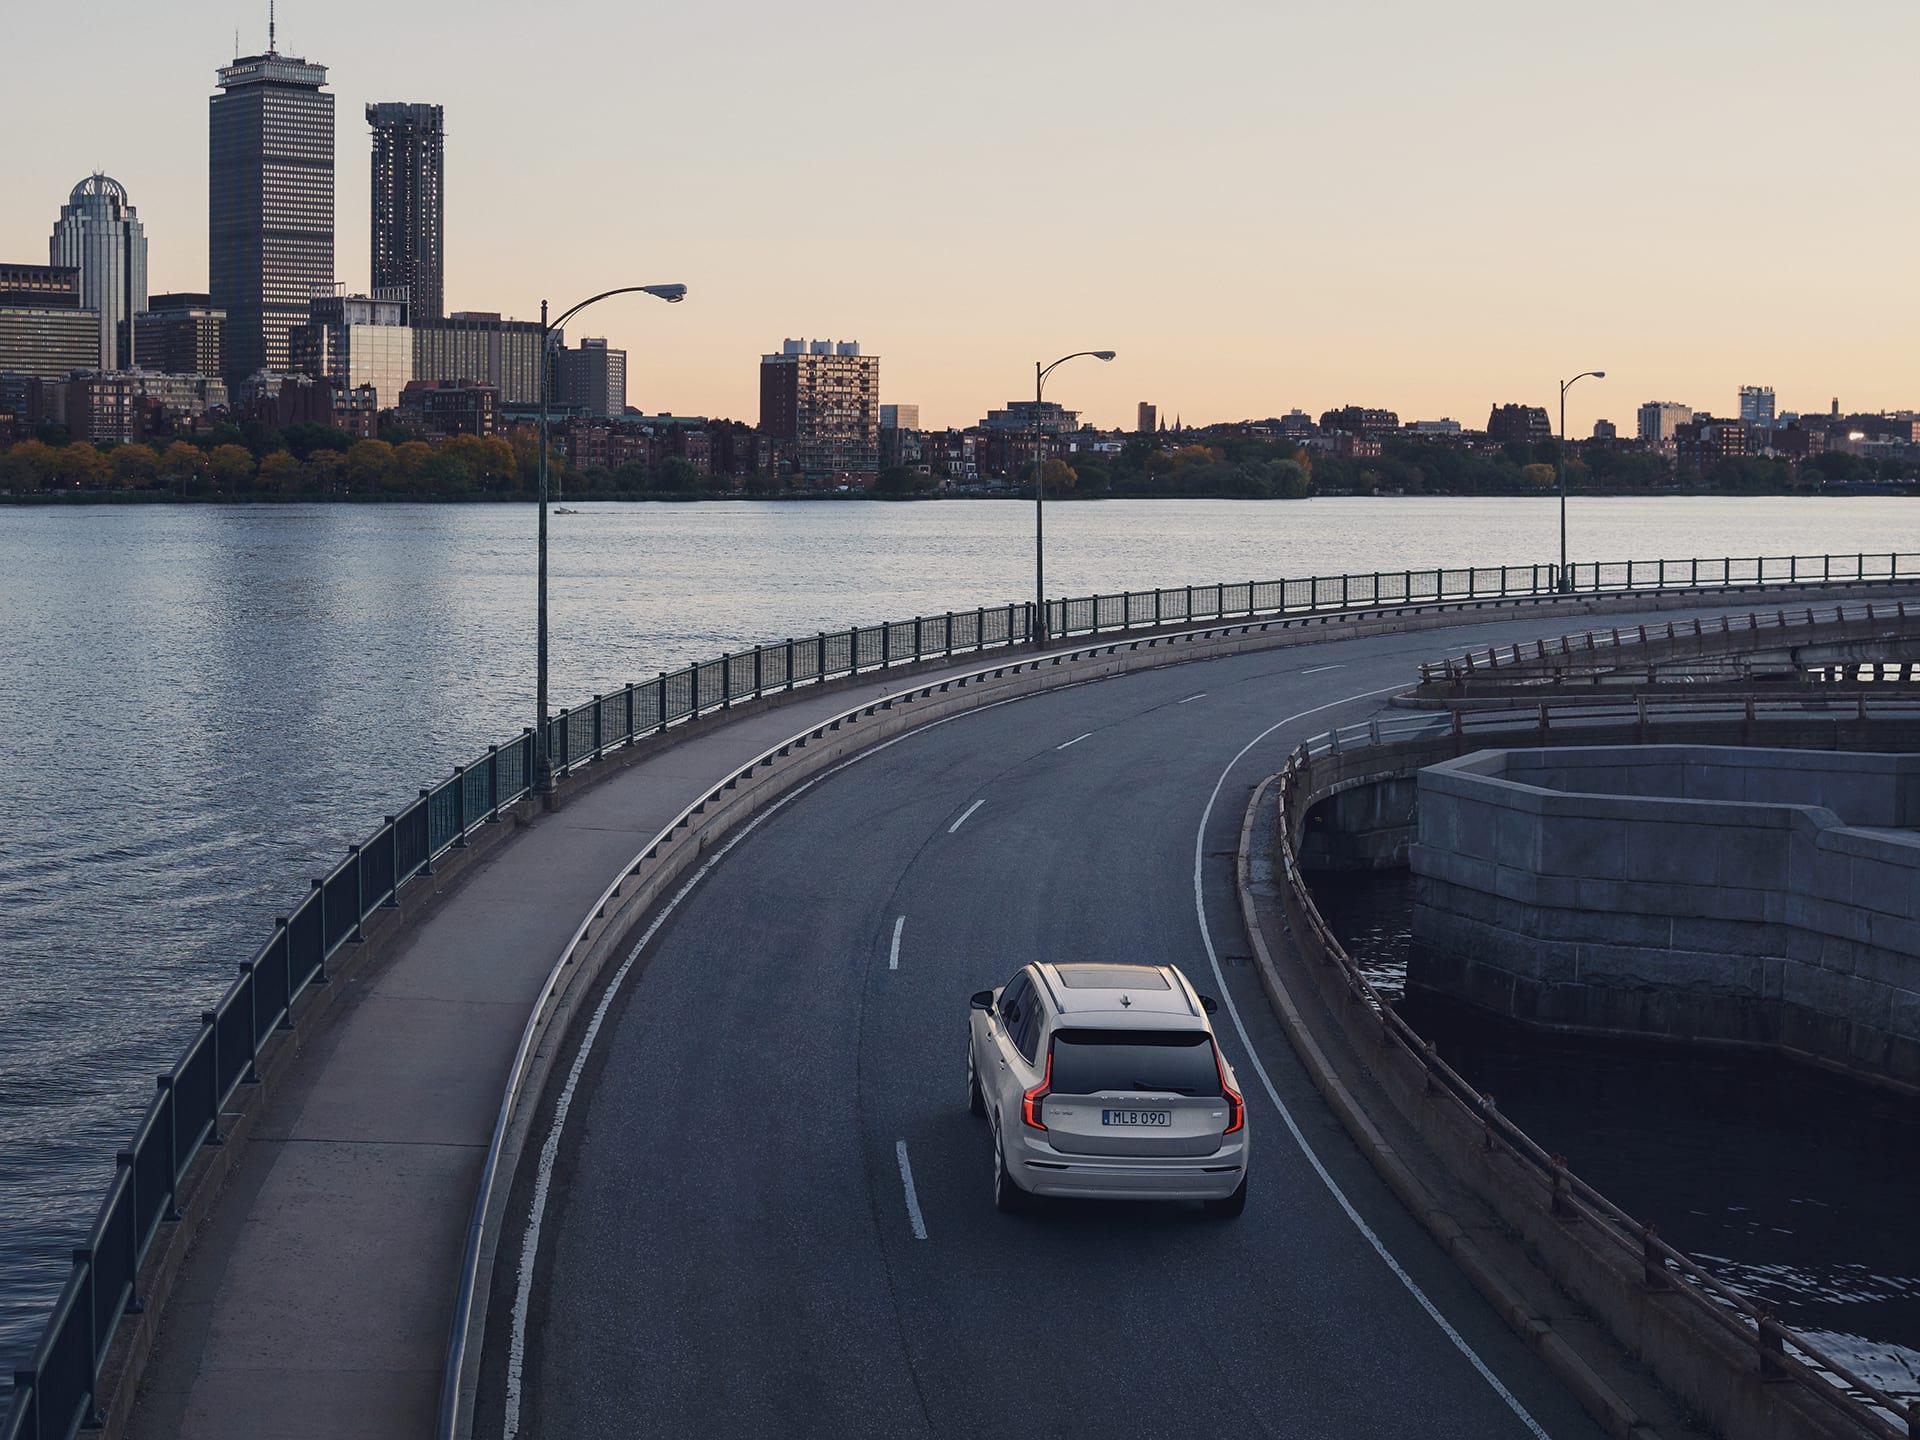 Volvo XC90 Recharge prati krivinu uz reku.